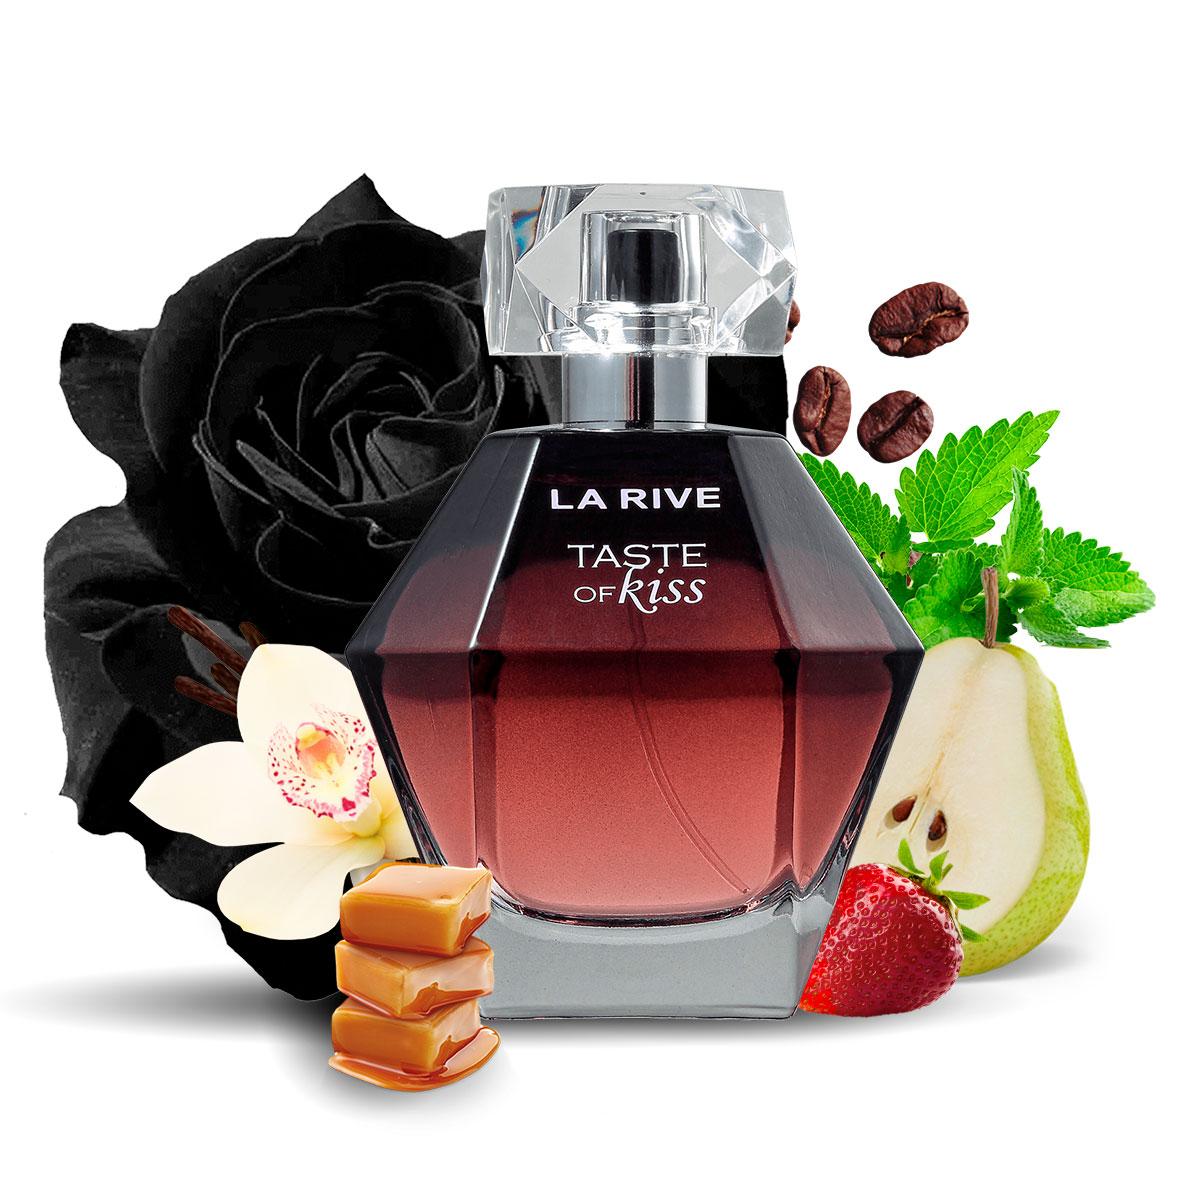 Kit 2 Perfumes Importados In Flames e Taste of Kiss La Rive  - Mercari Perfumes